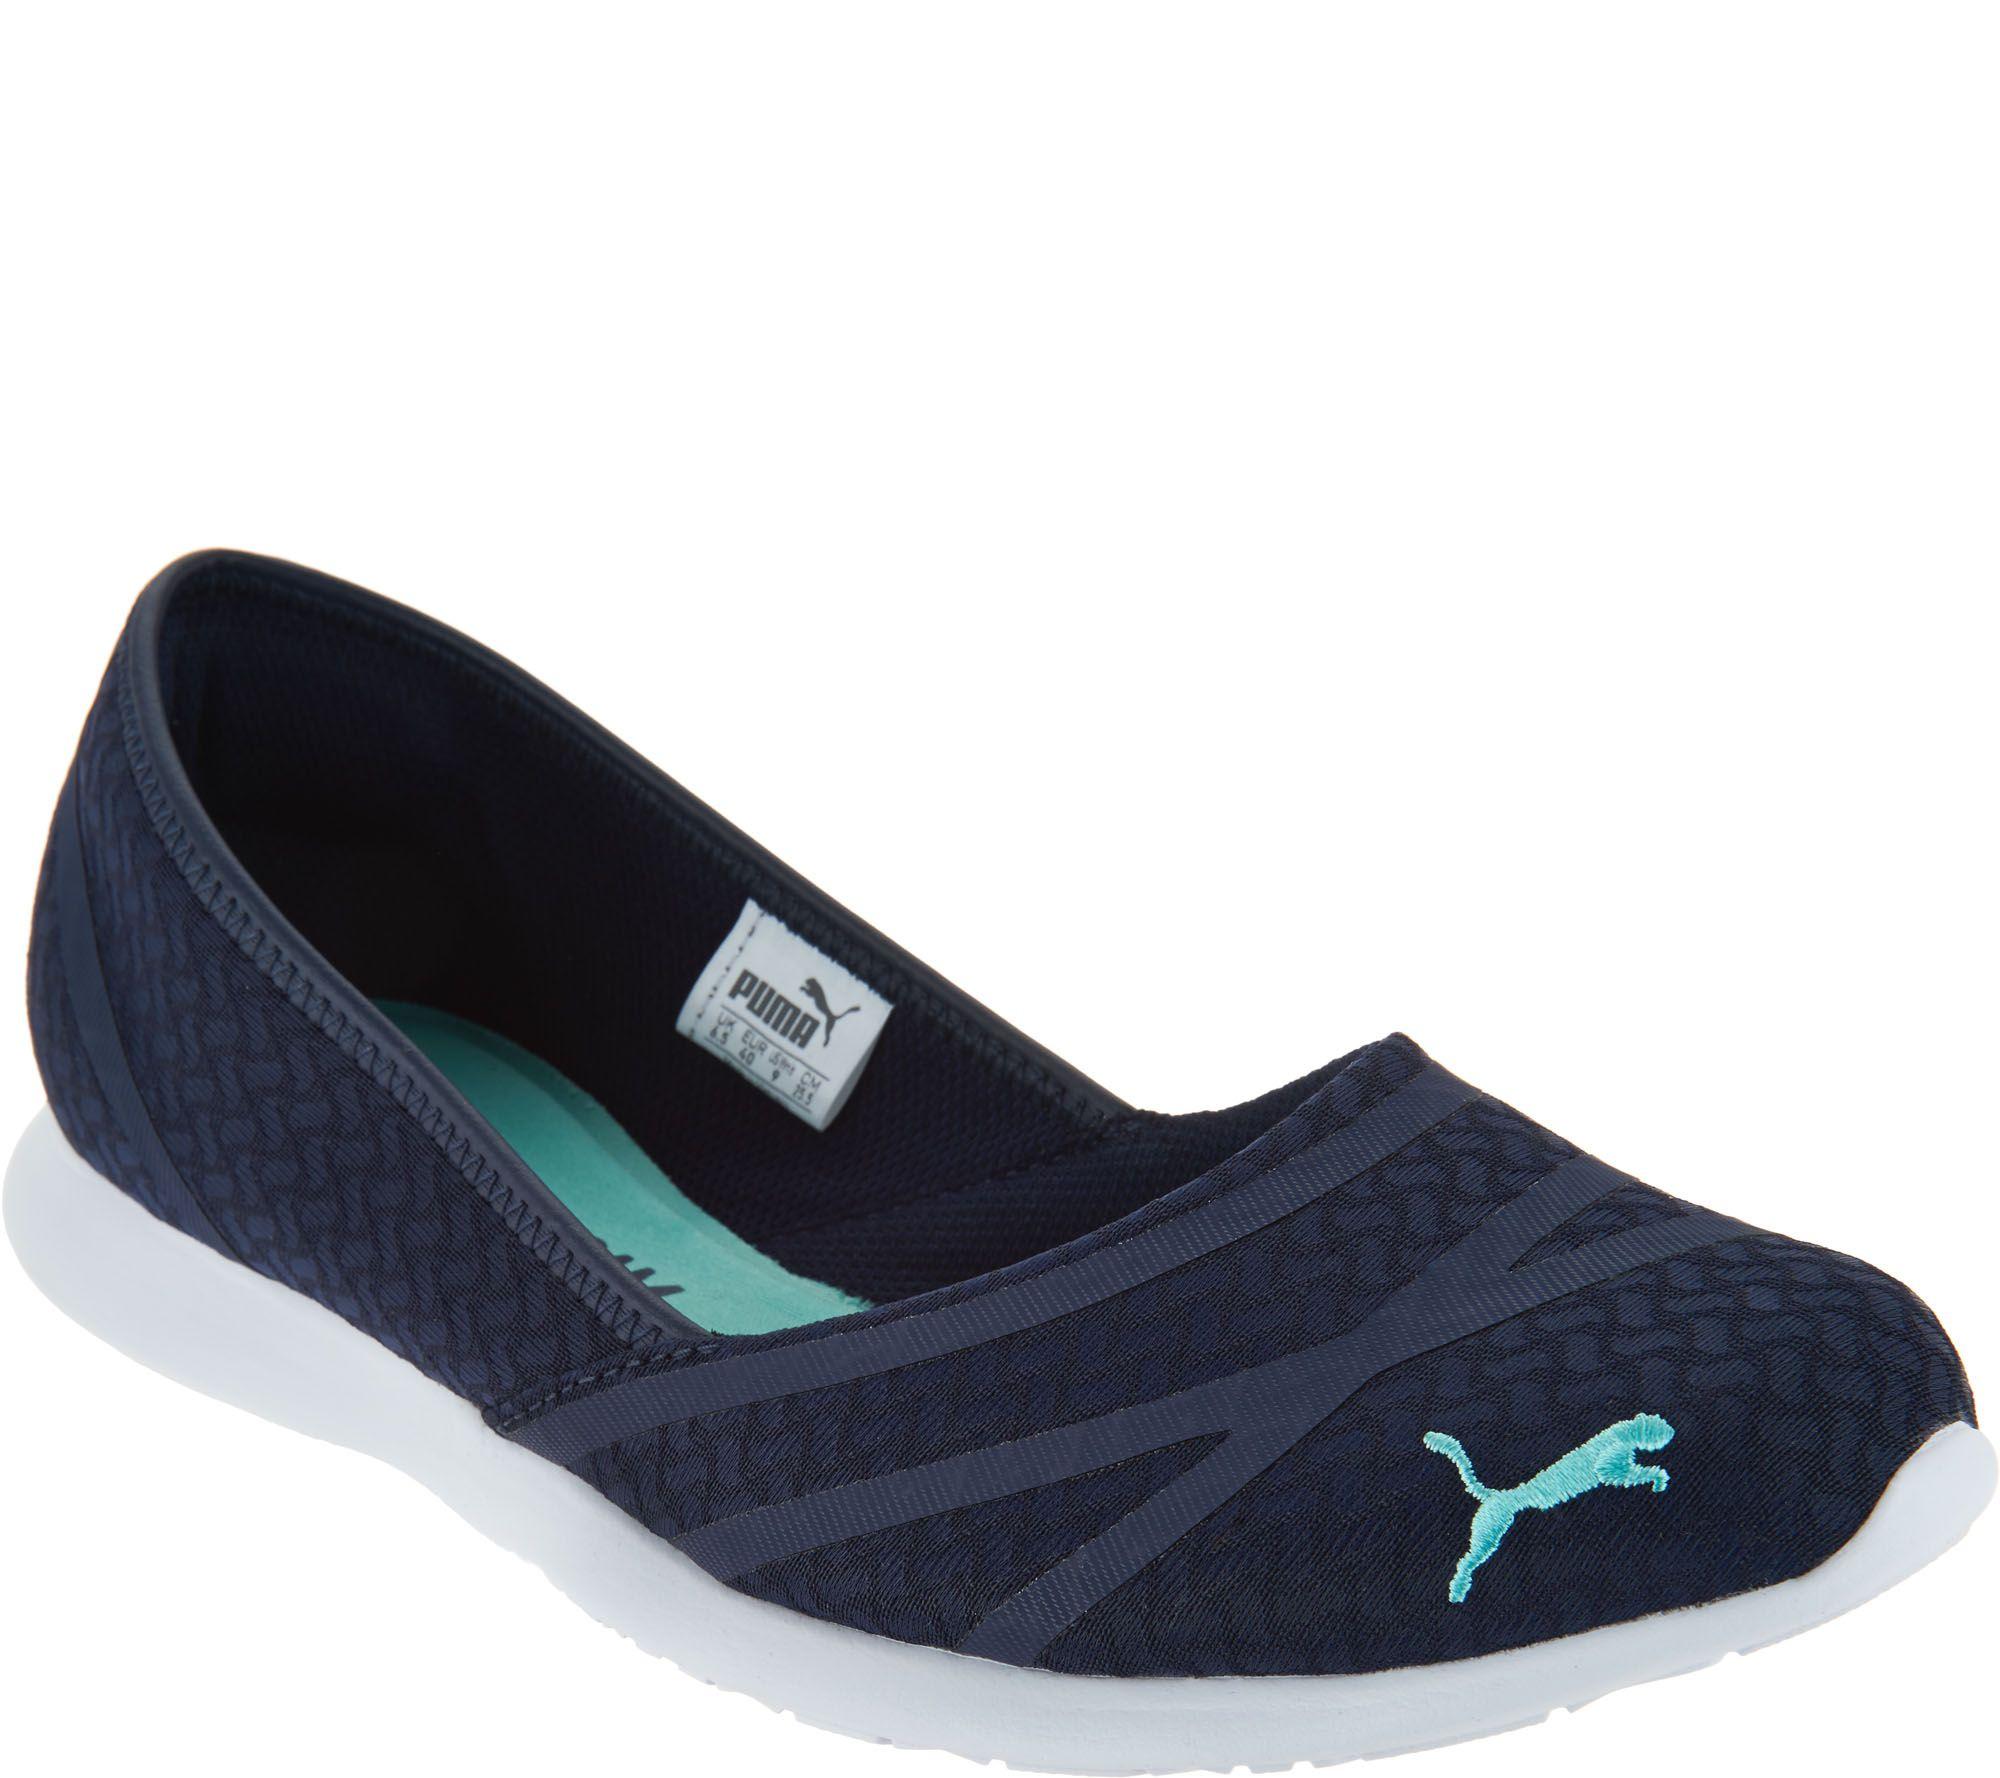 9b272f7b1b7f PUMA Slip-On Mesh Sneakers - Vega Ballet Flume - Page 1 — QVC.com